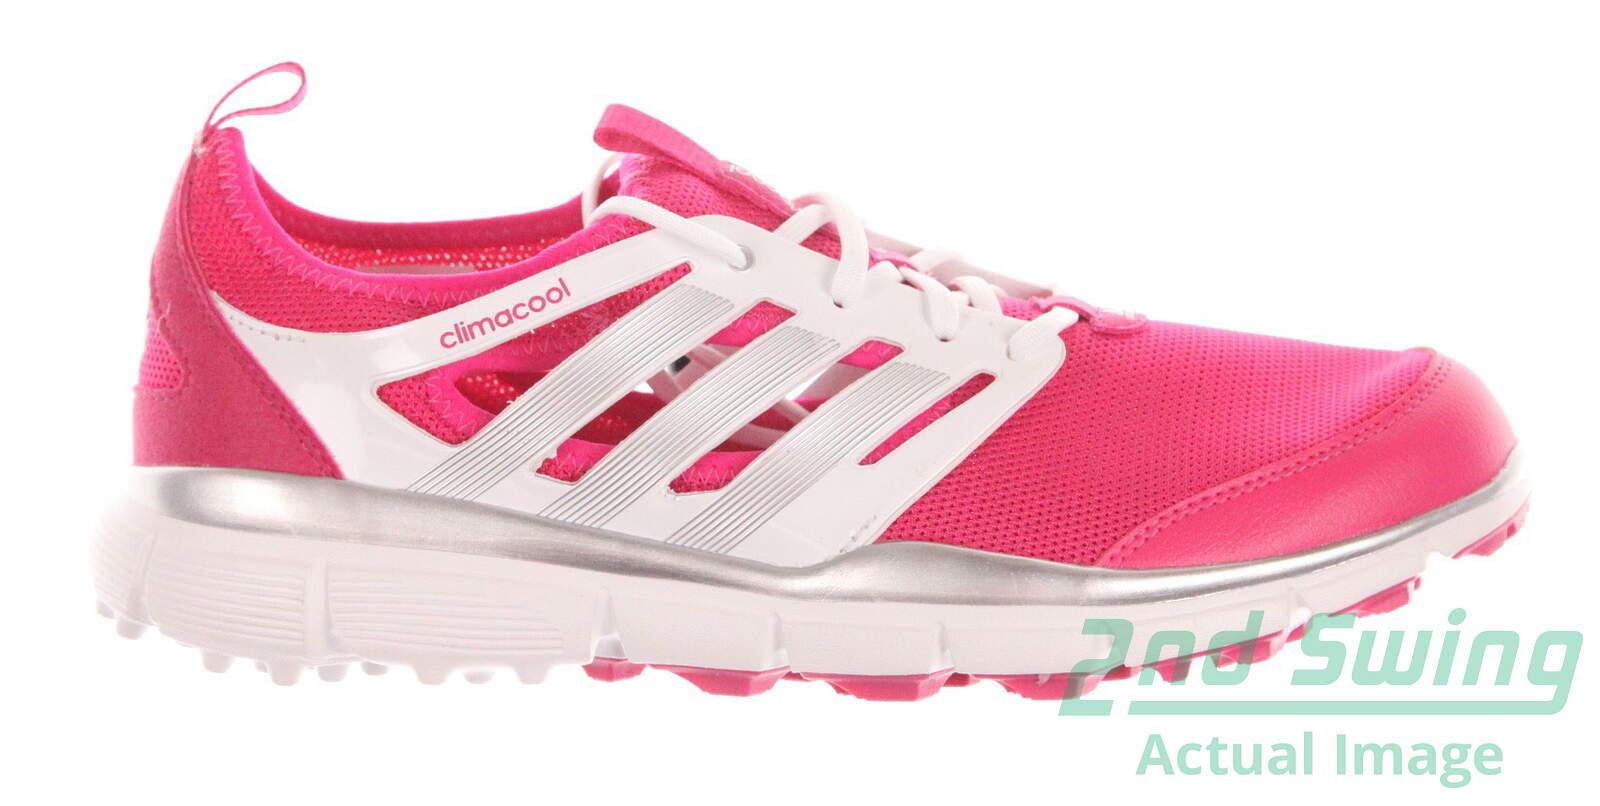 premium selection ae3b6 e6ff5 New Womens Golf Shoe Adidas Climacool II Medium 7 Pink MSRP ...